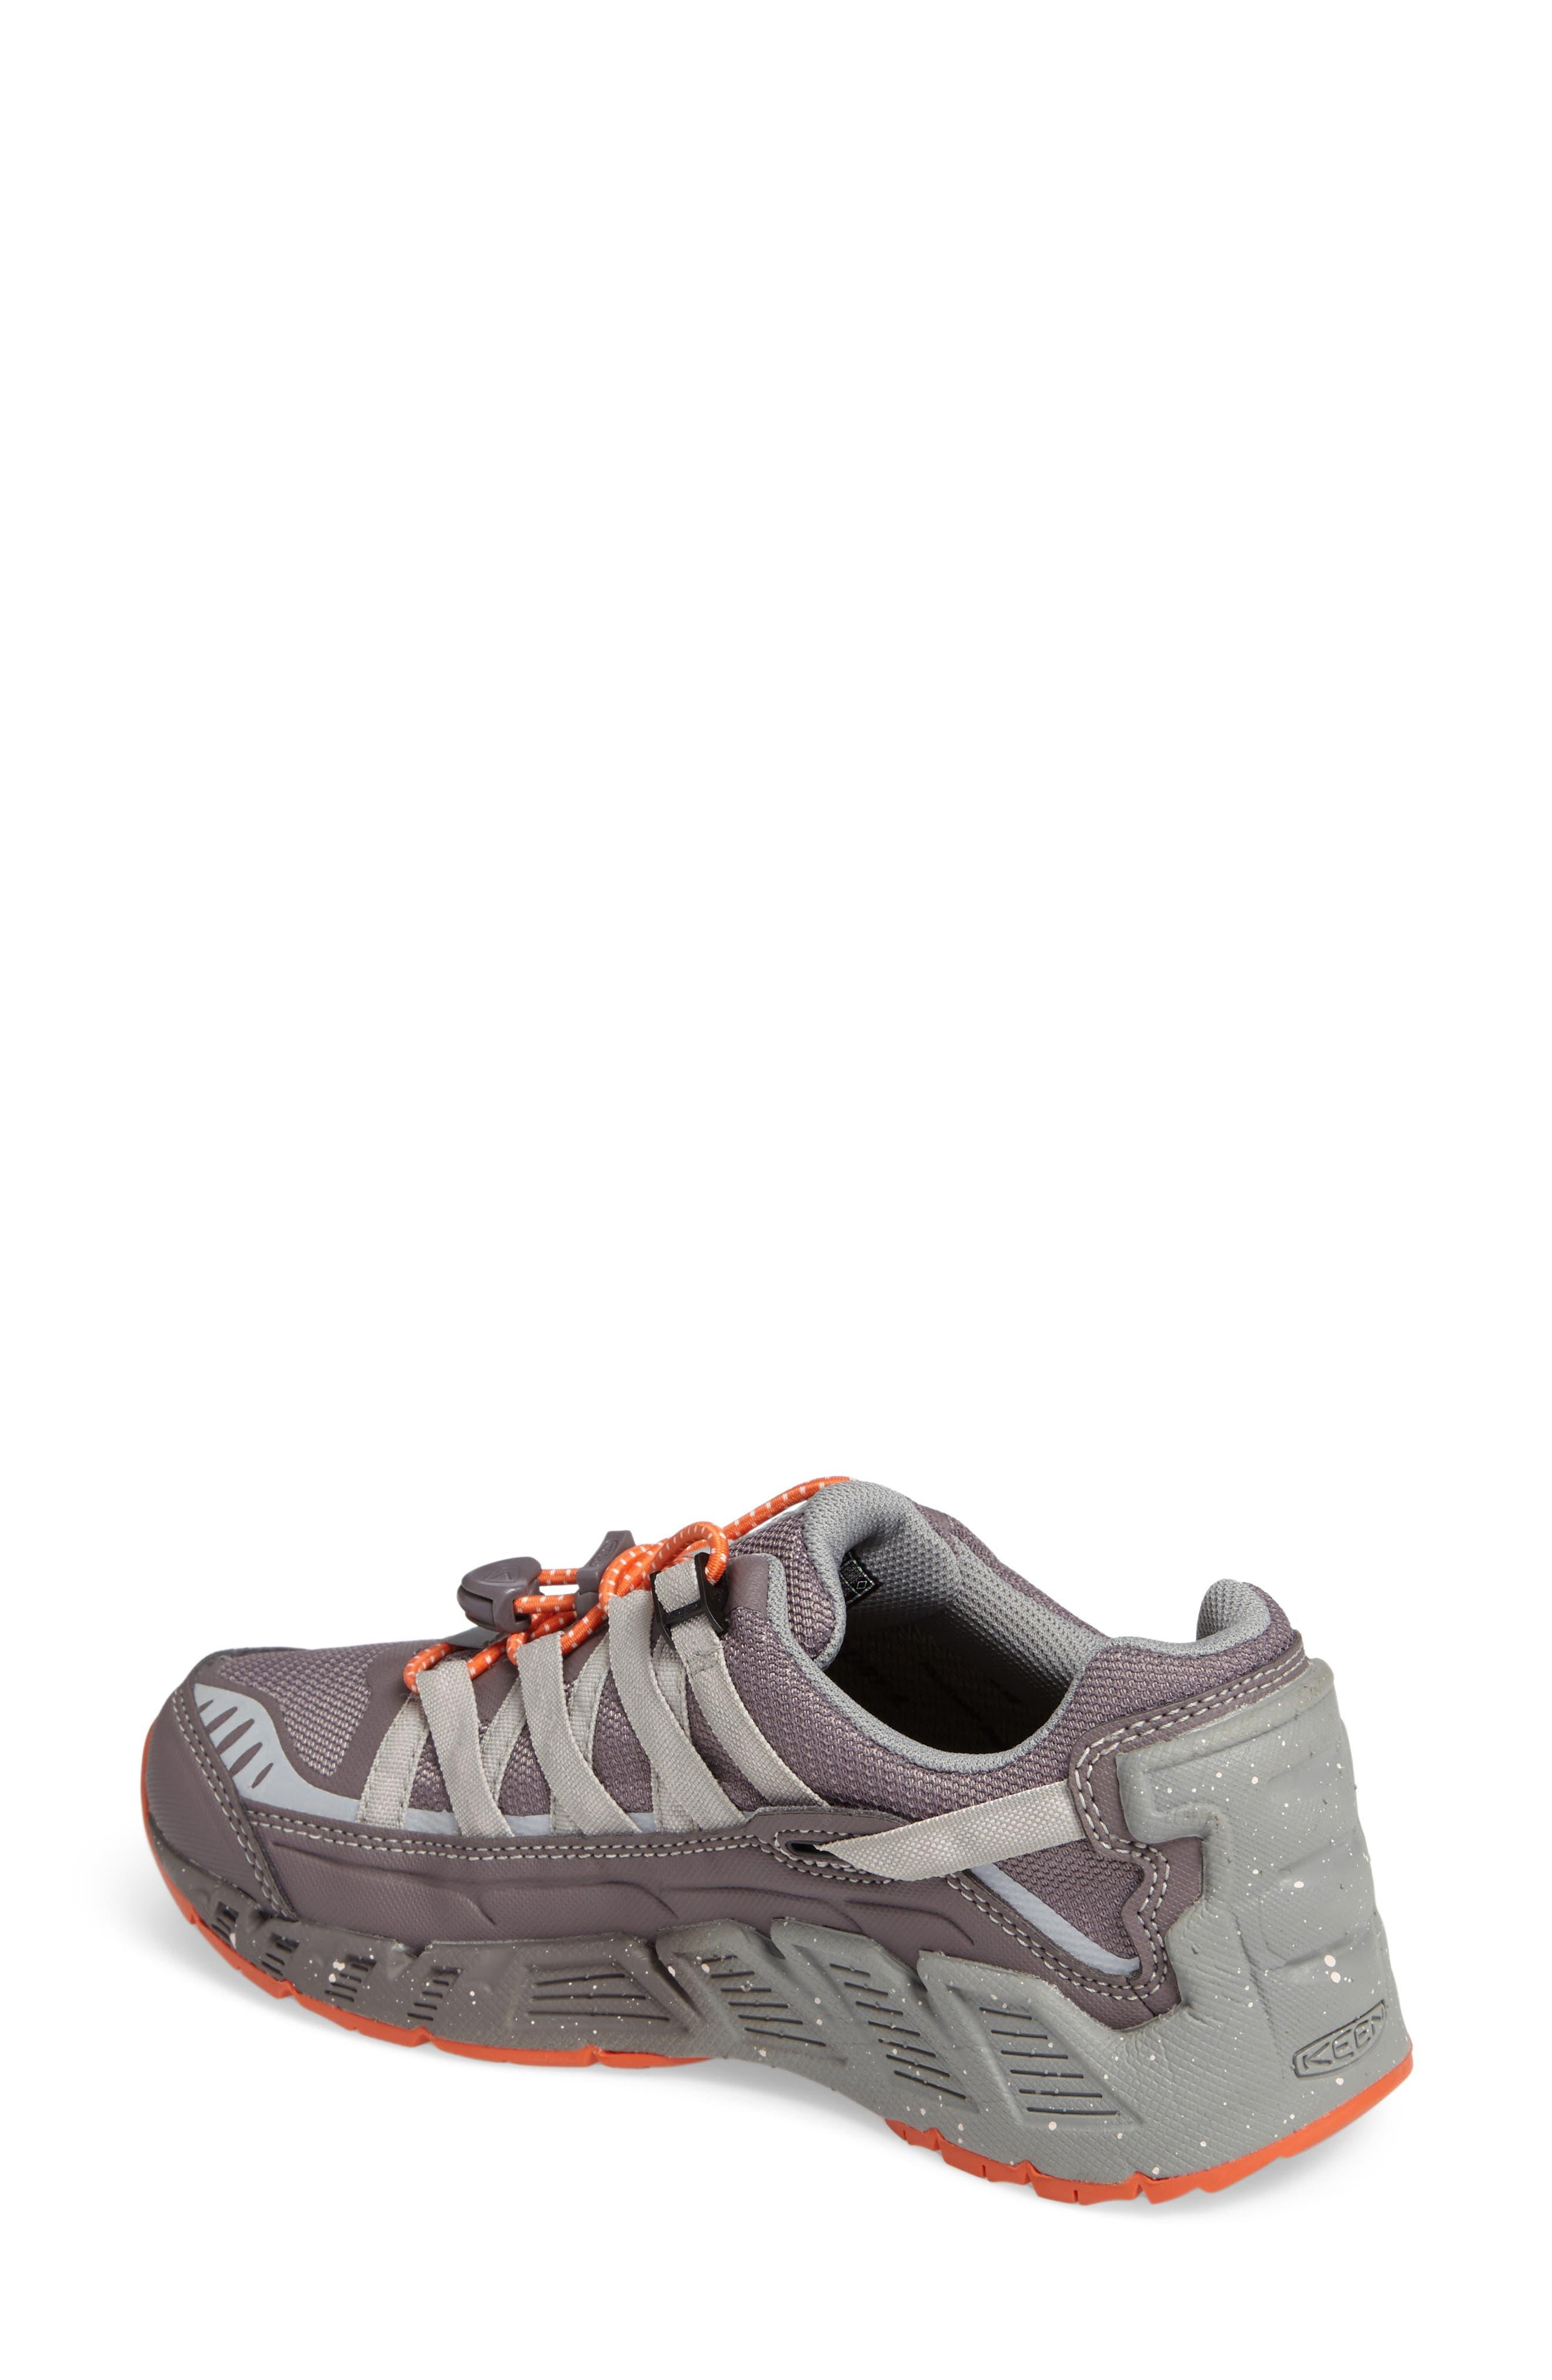 Alternate Image 2  - Keen 'Versatrail' Waterproof Hiking Shoe (Women)